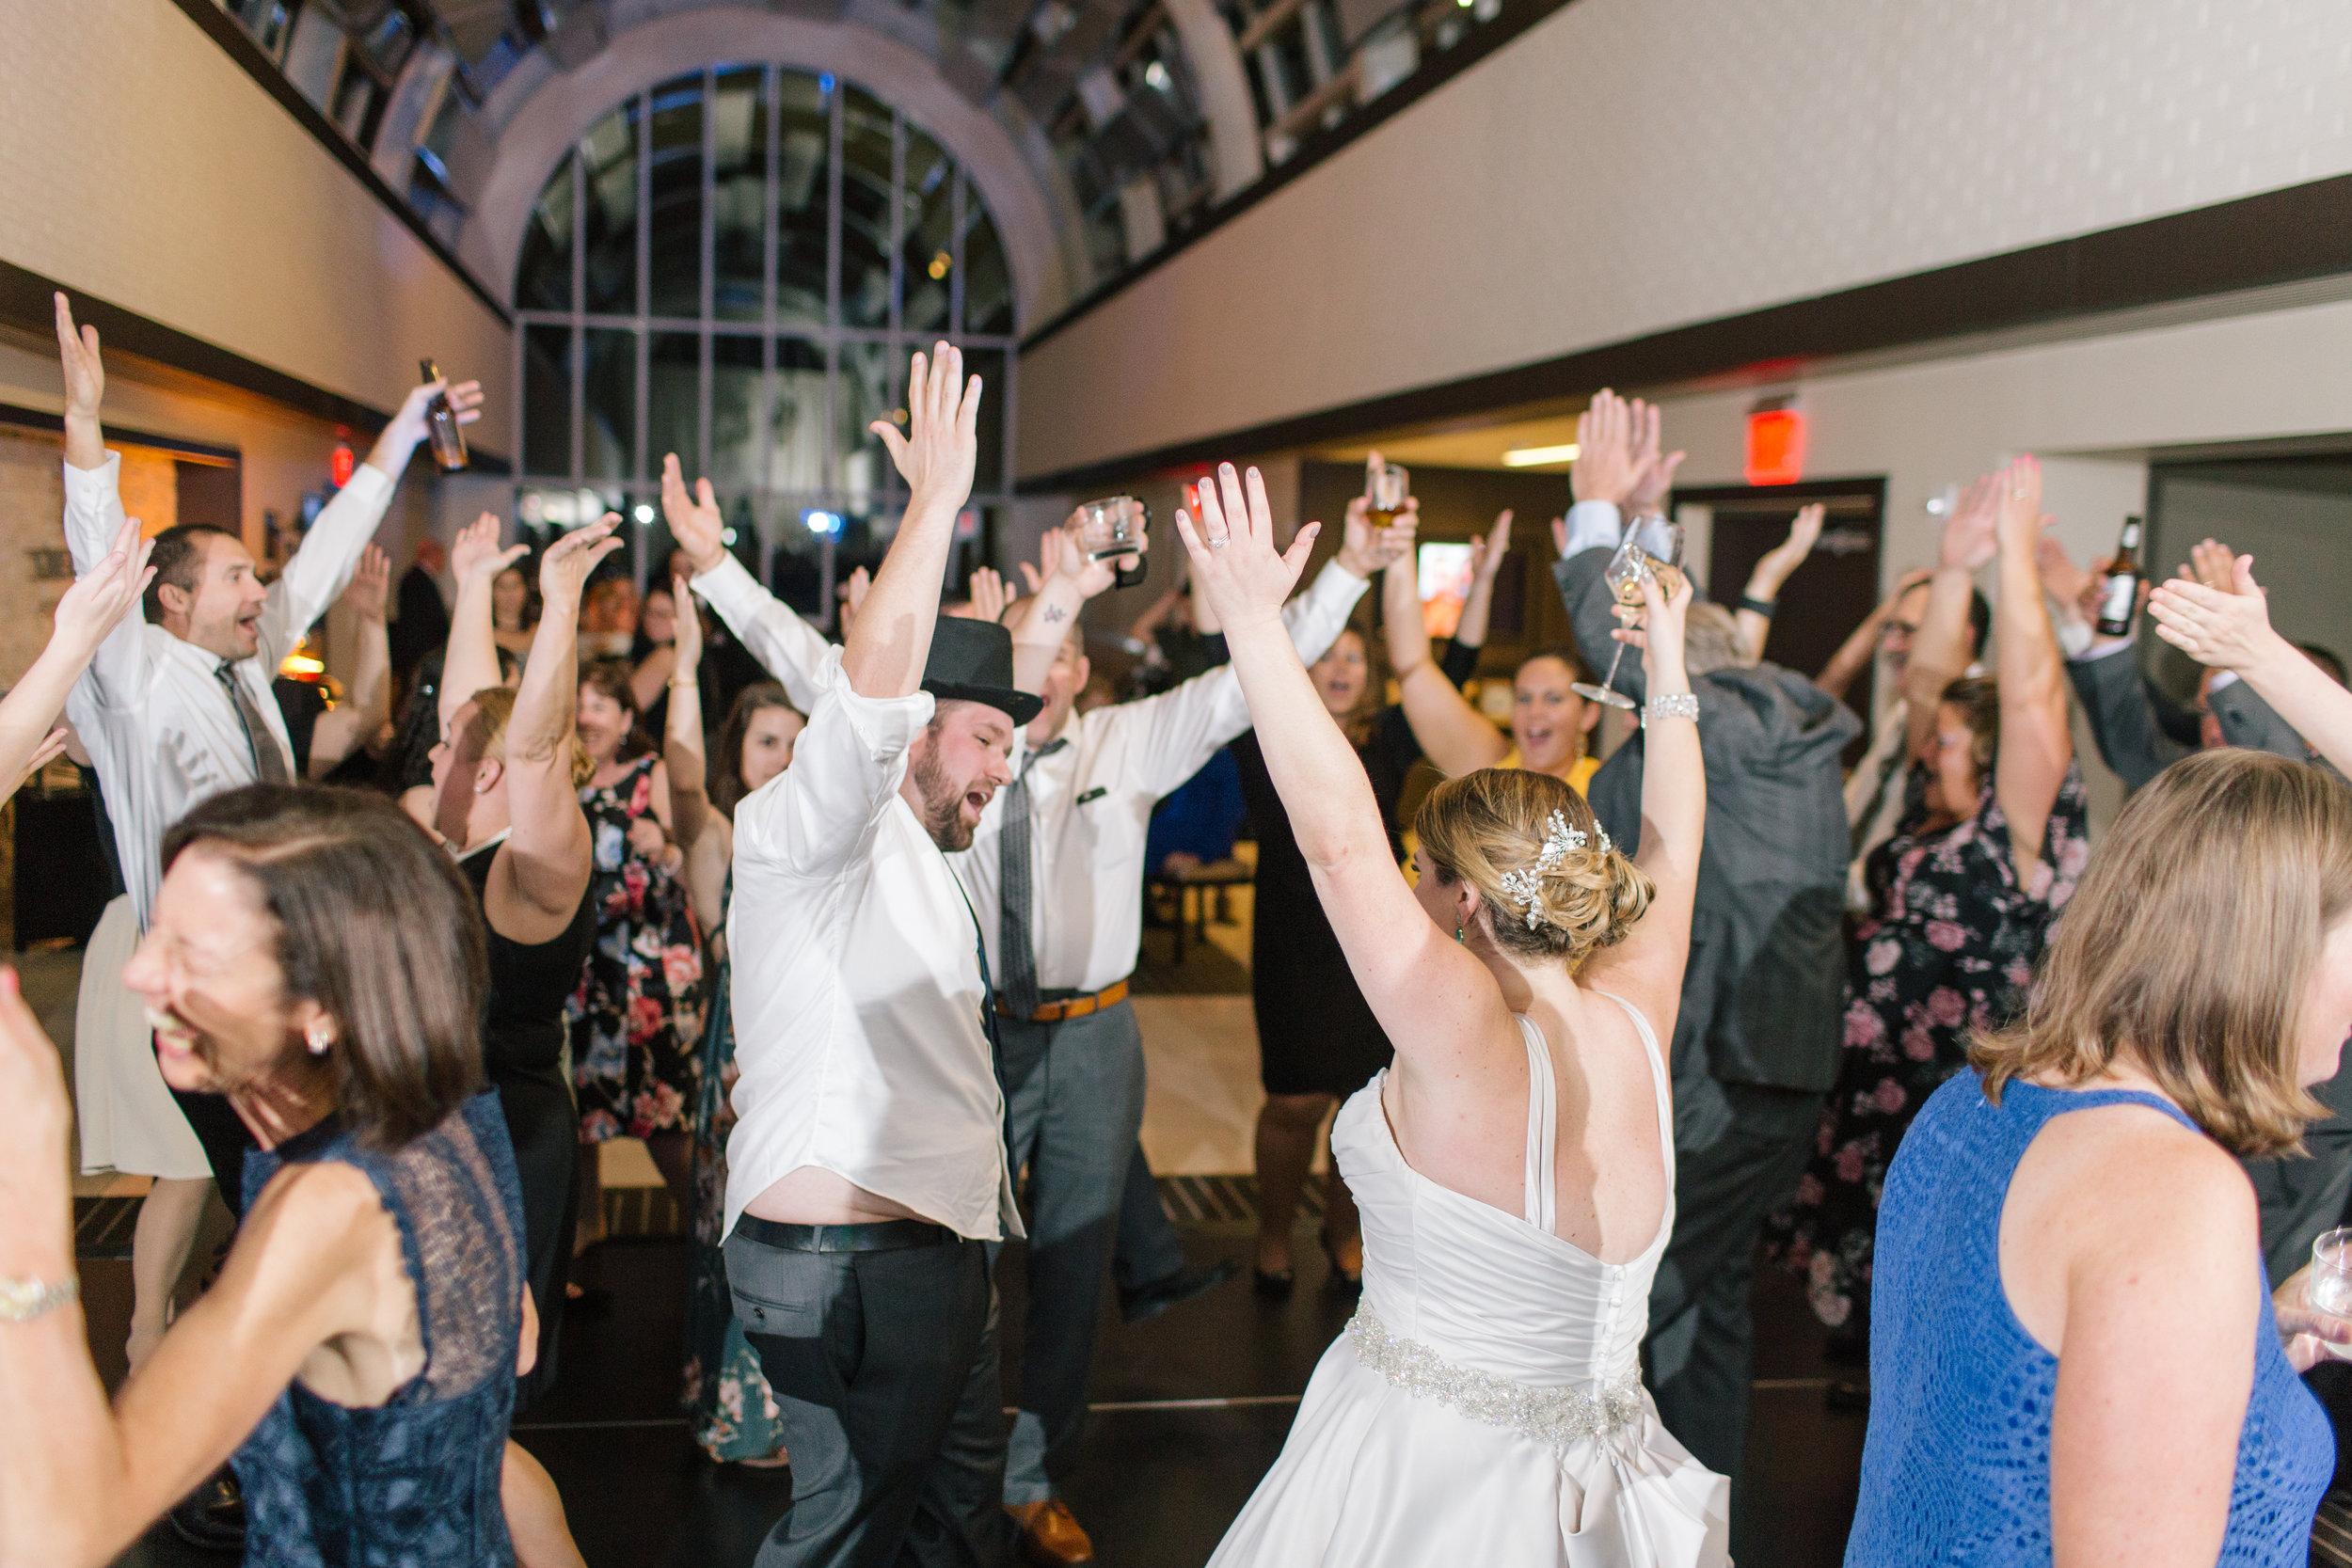 Wedding DJ in Fredrick, MD